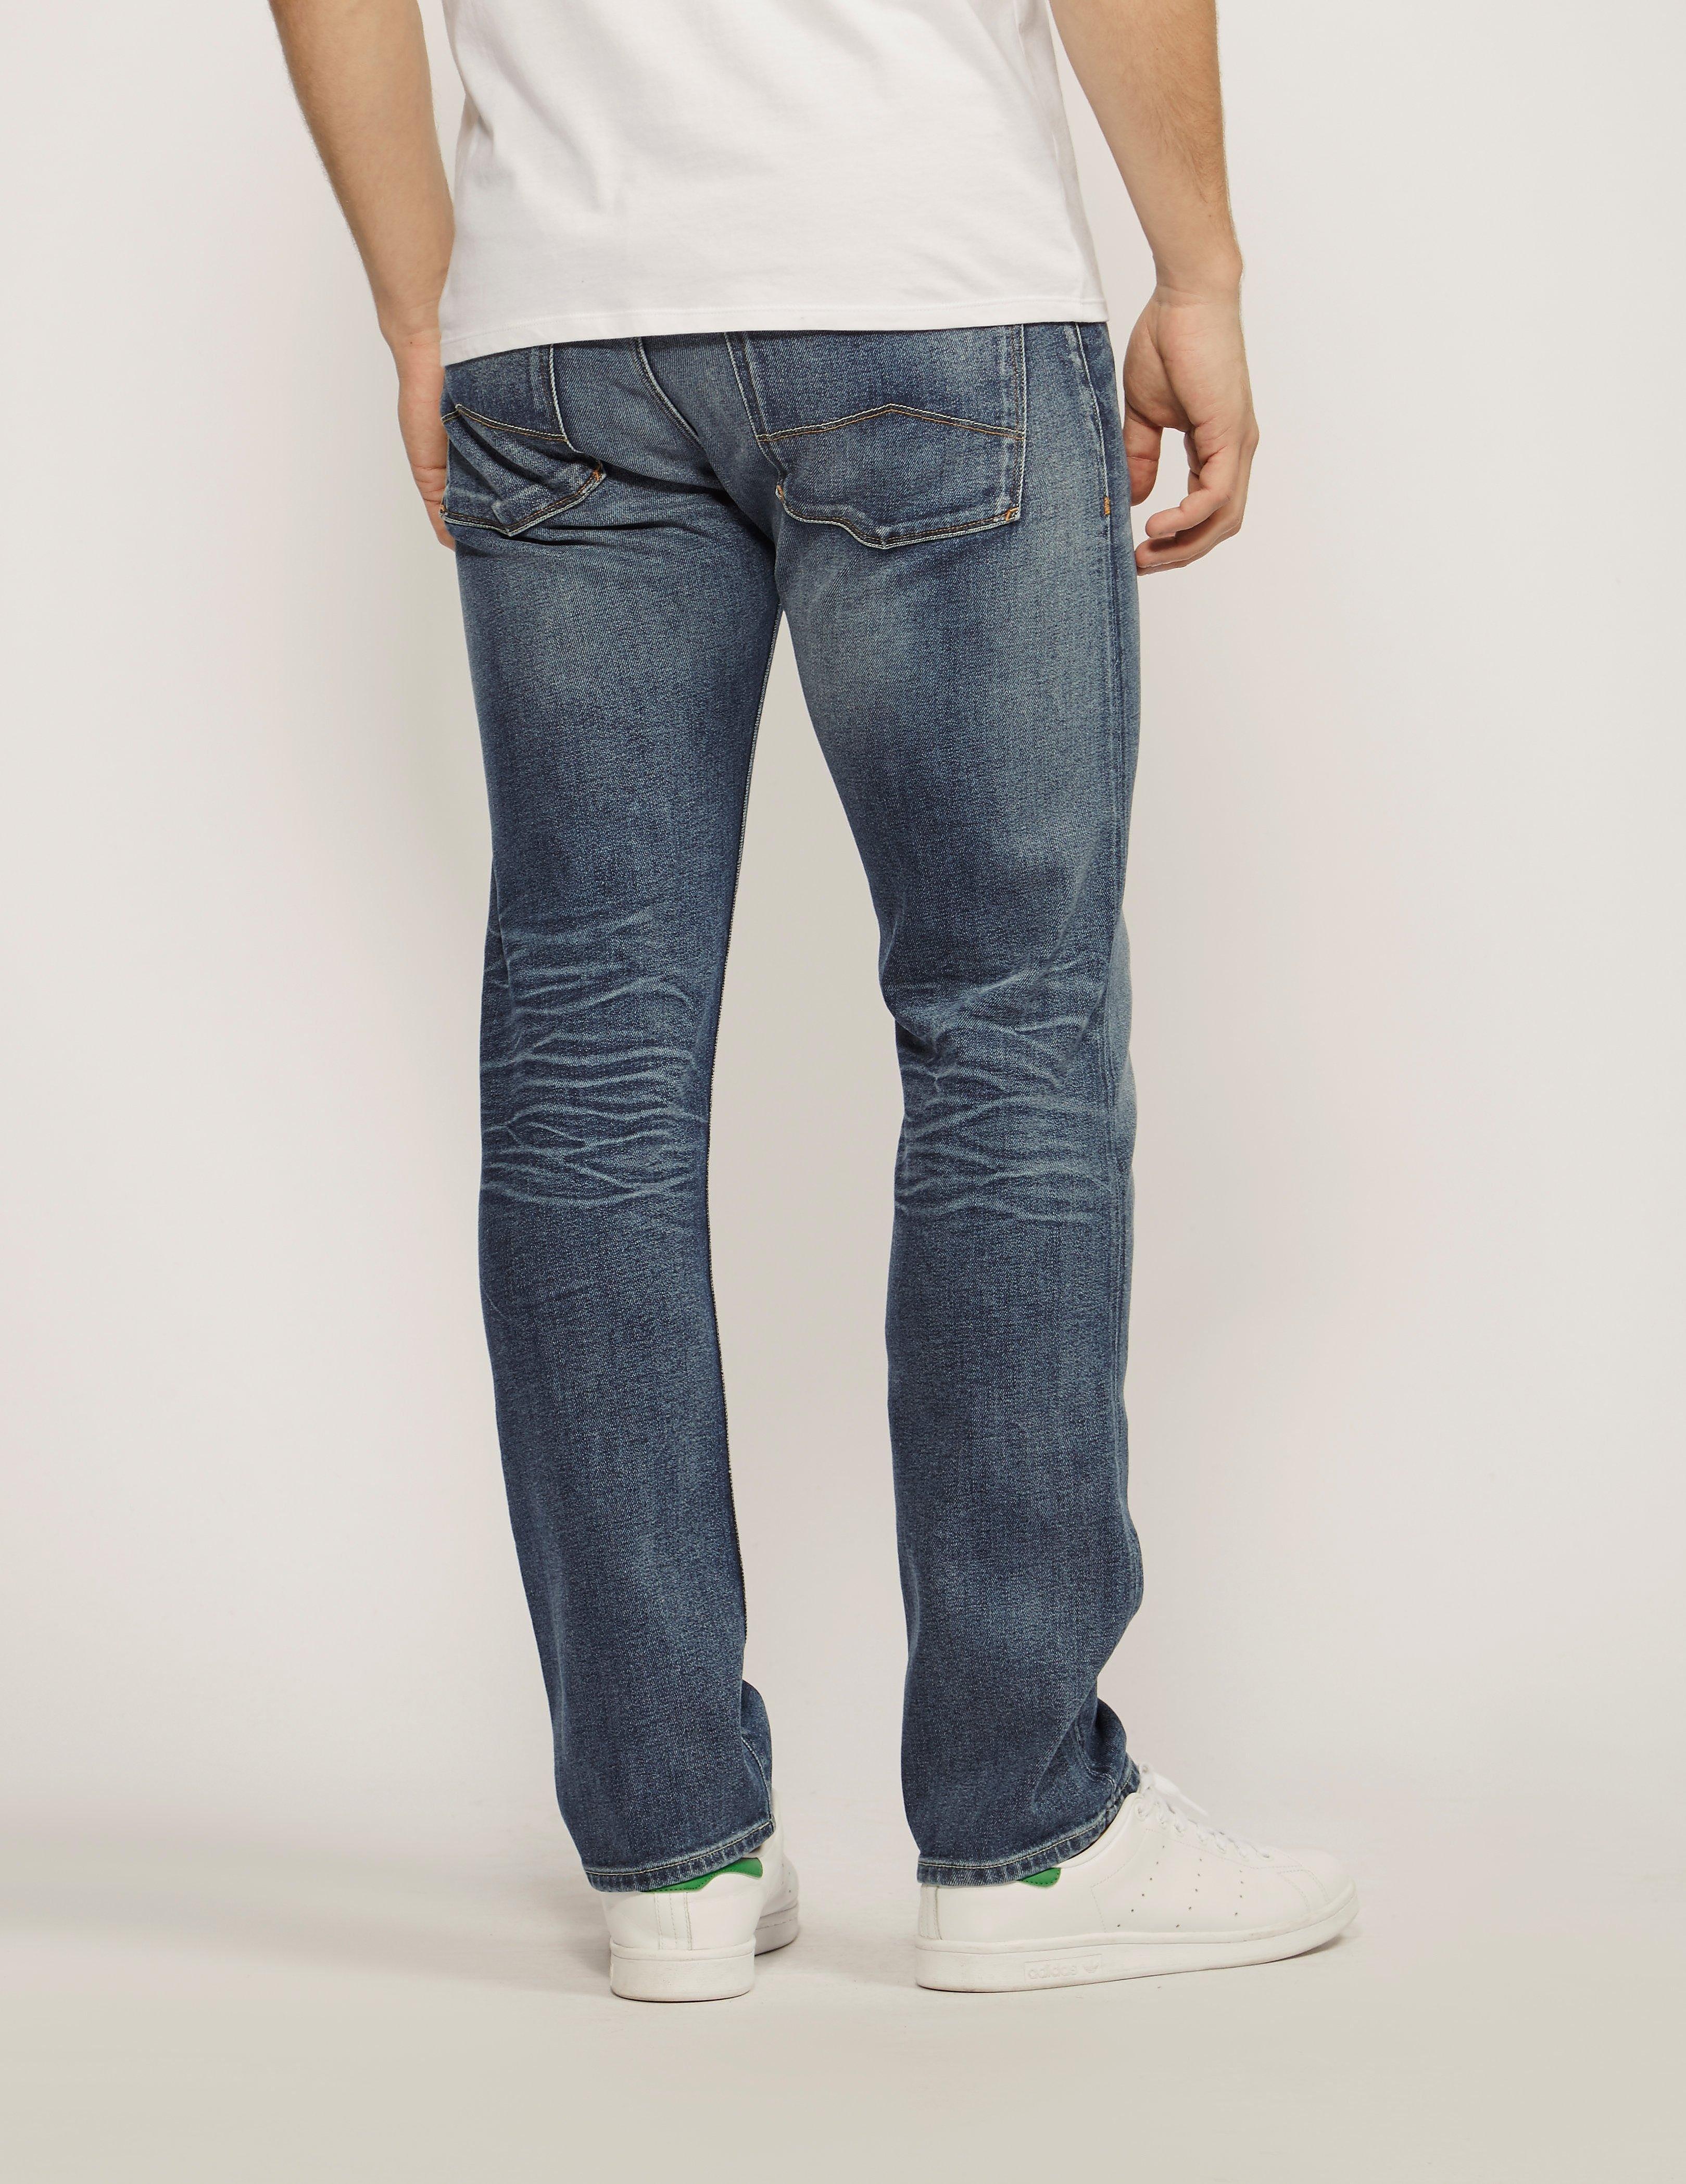 Armani Jeans J45 Regular Fit Jeans - Short